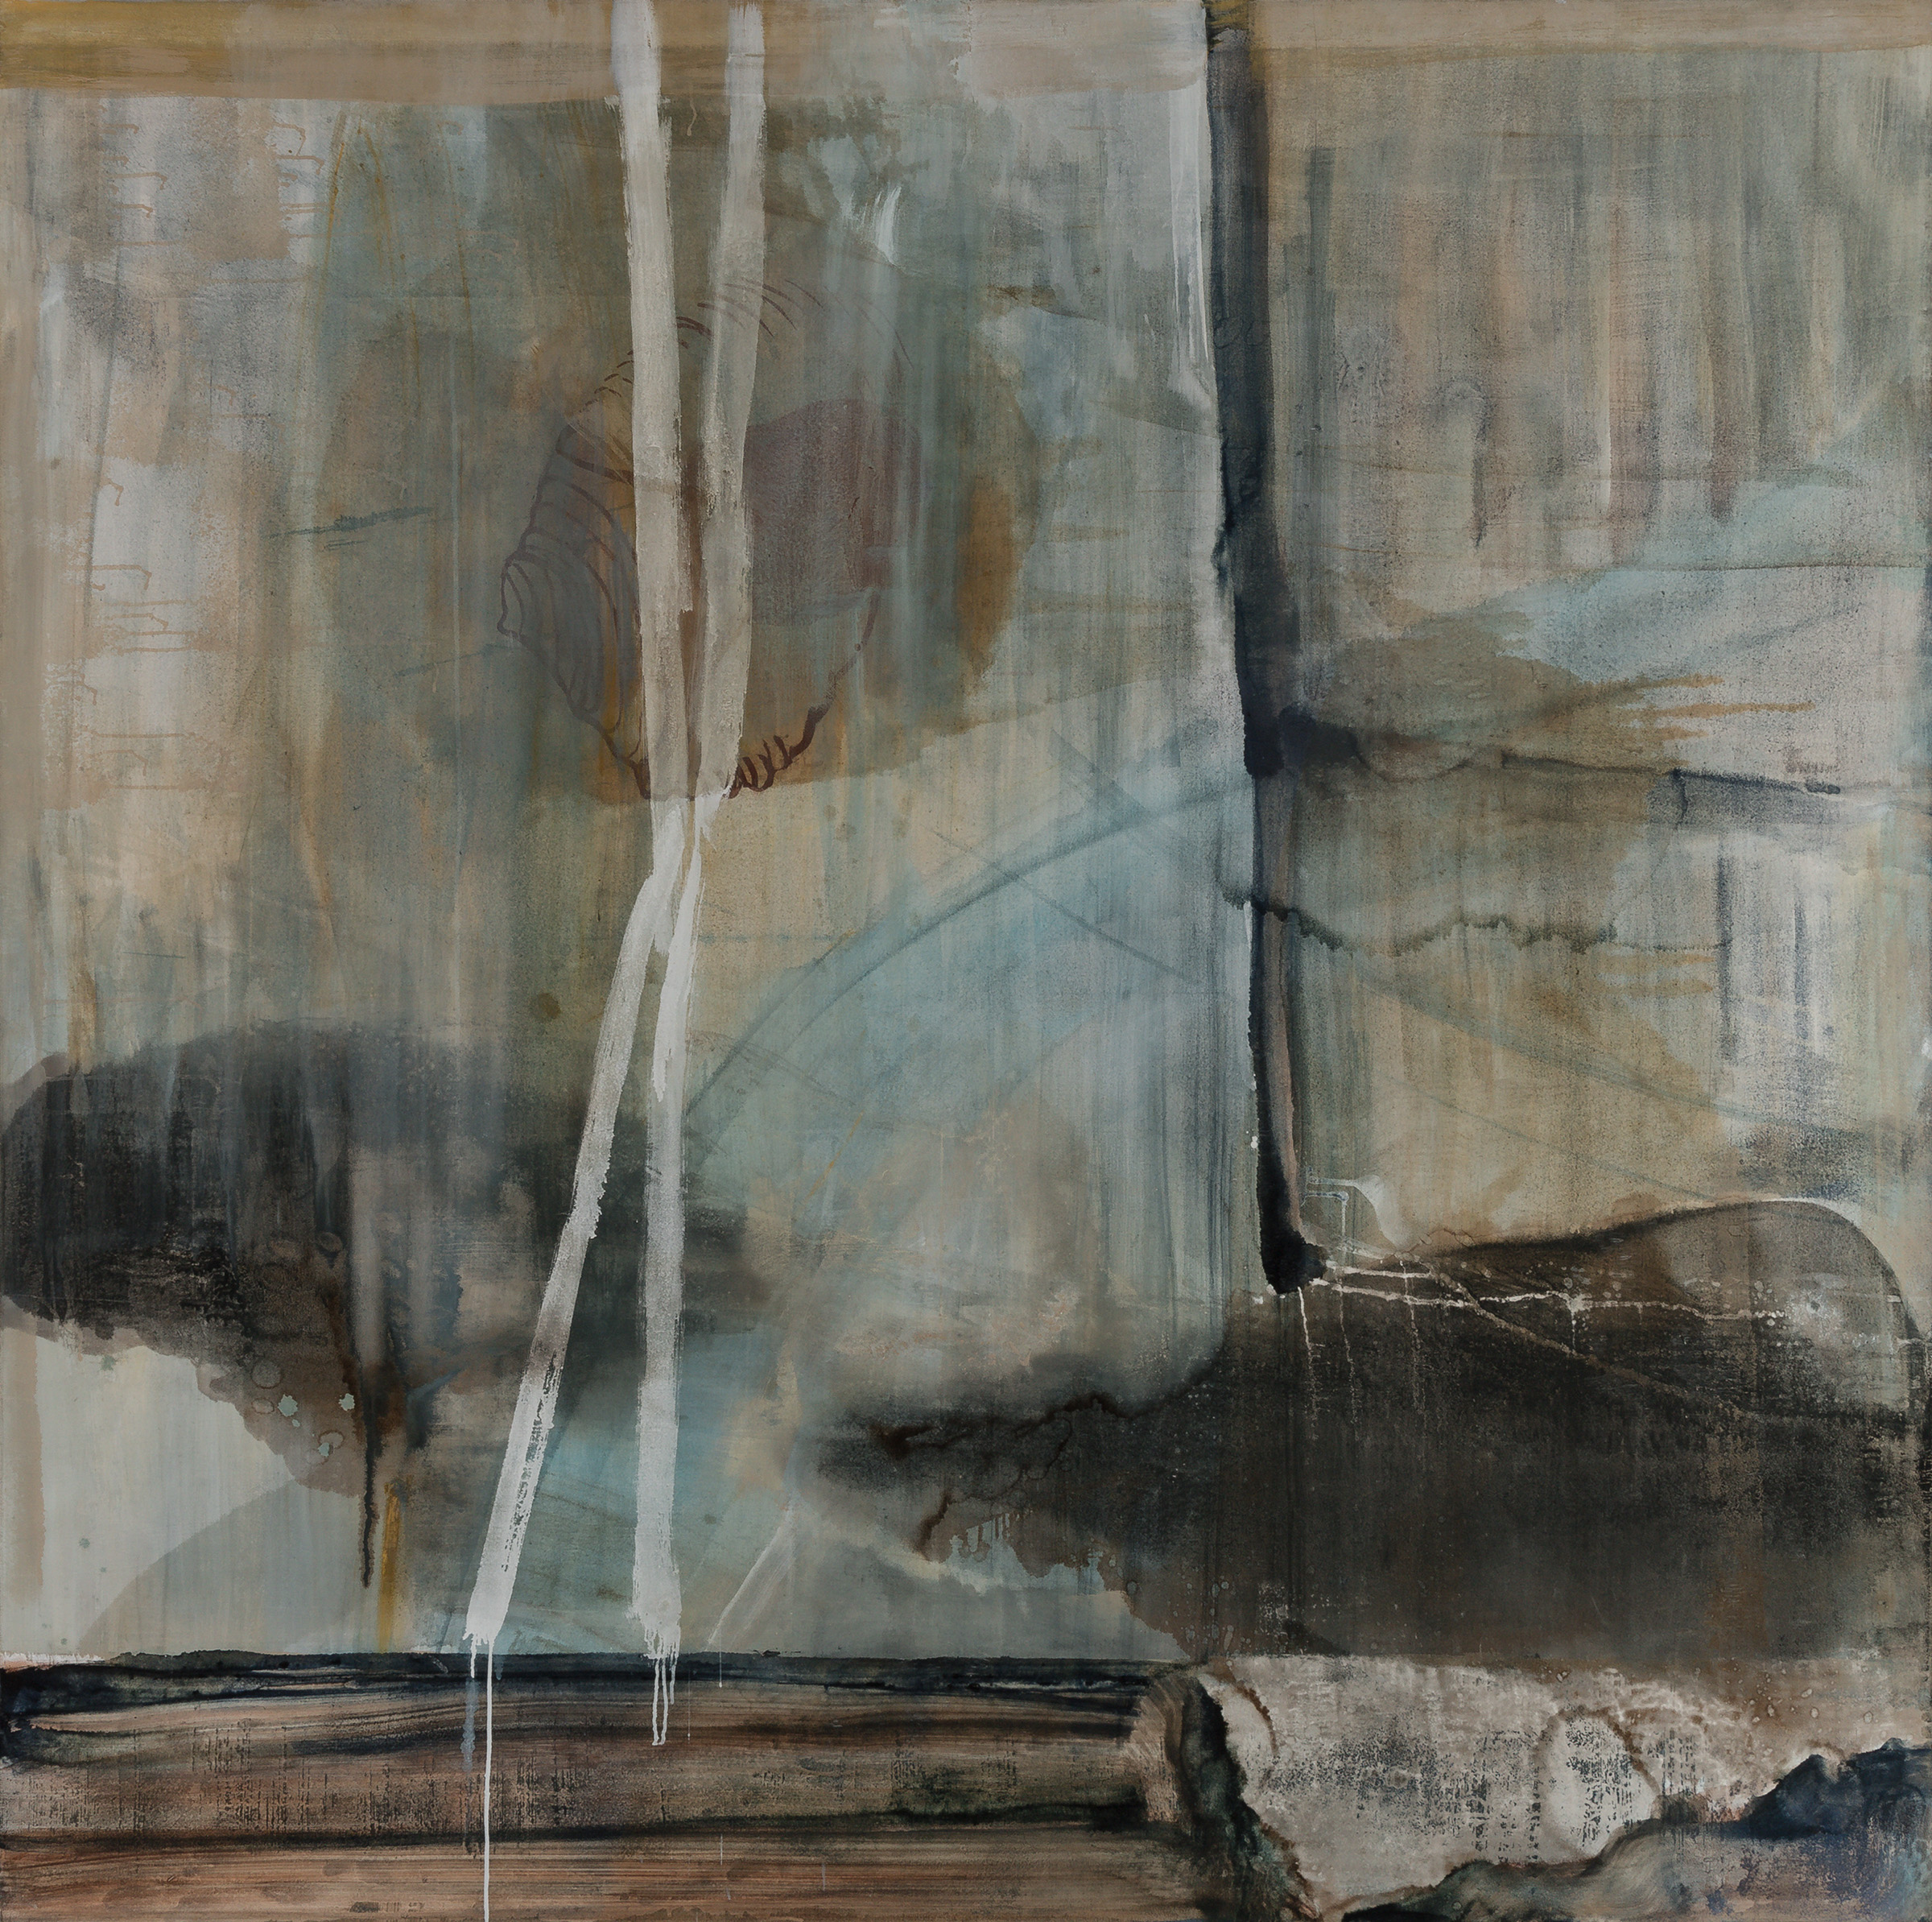 """Llimpe"", 1990-1991. JUAN USLÉ"